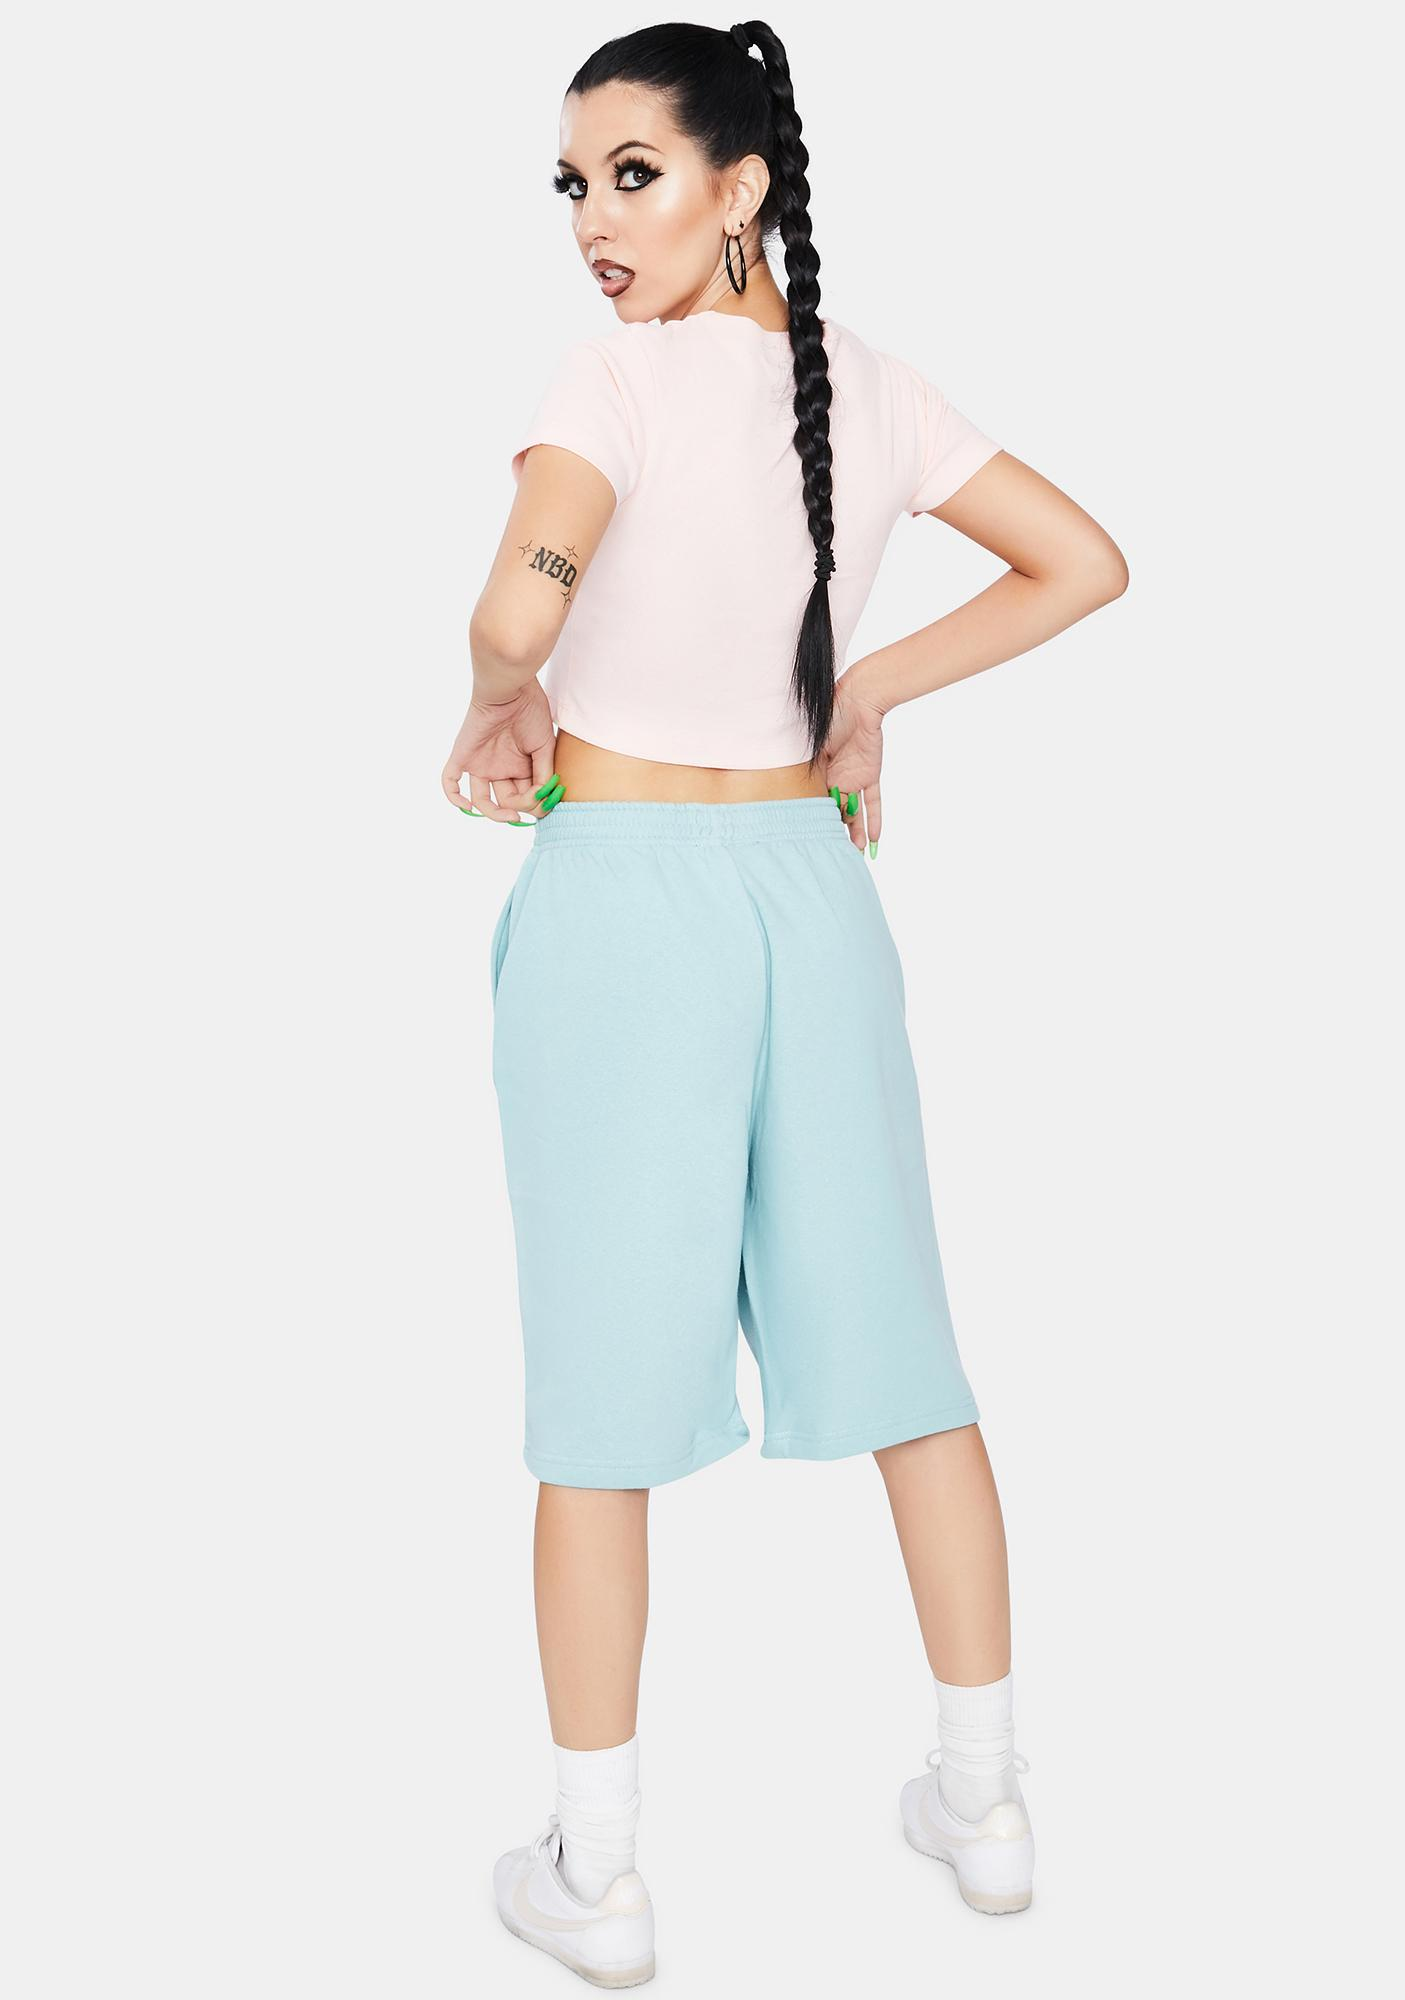 NEW GIRL ORDER Outline Flame Sport Shorts